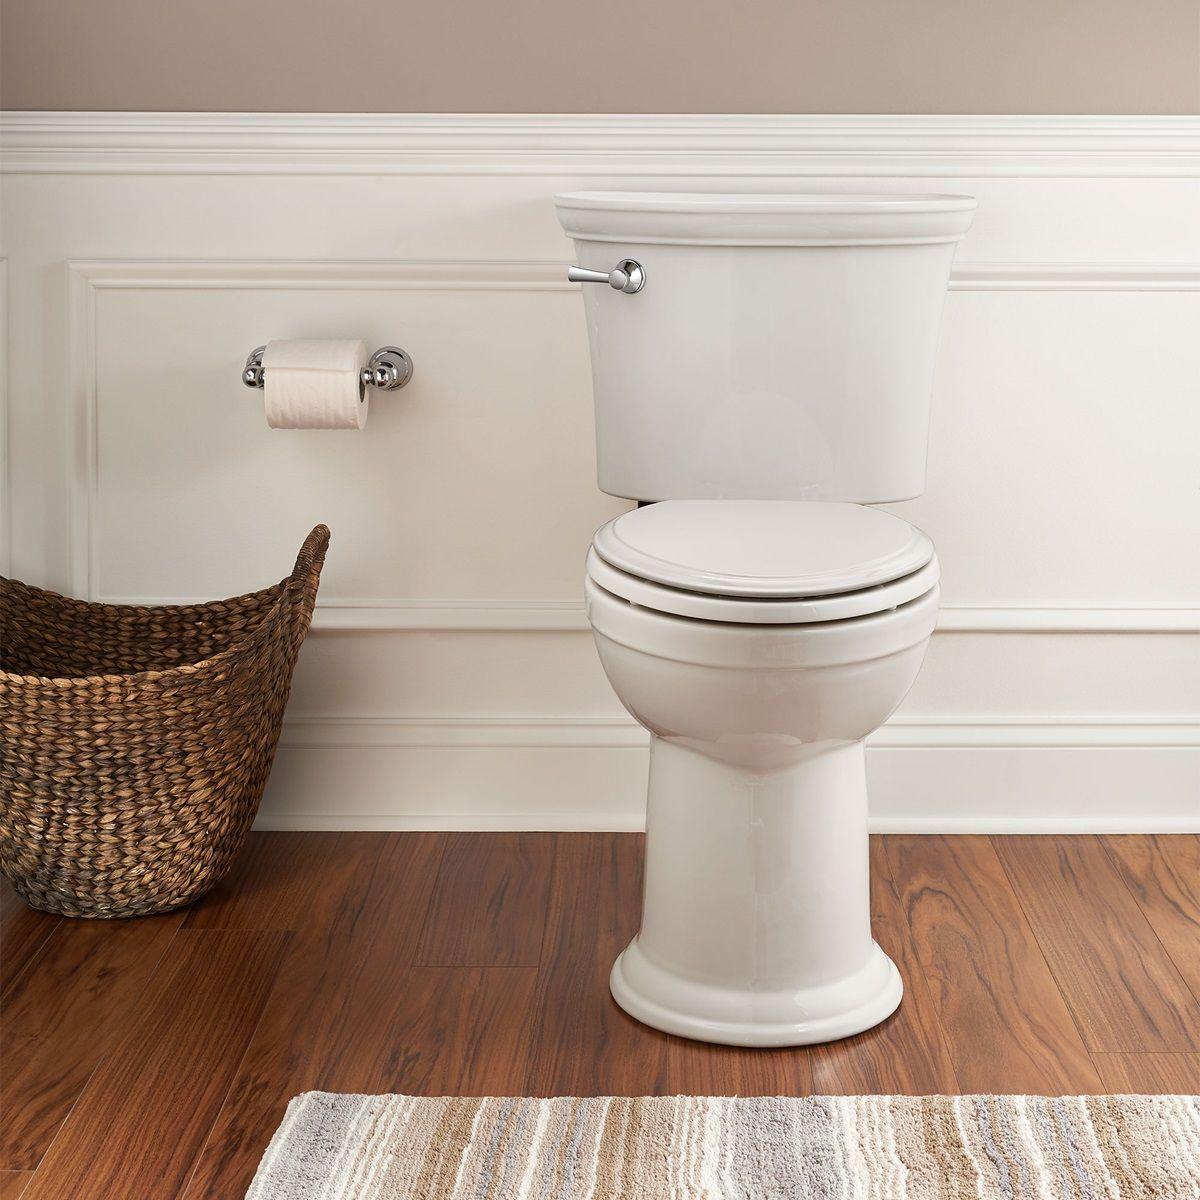 Excellent Esteem Vormax Right Height Elongated Toilet 1 28 Gpf Pabps2019 Chair Design Images Pabps2019Com